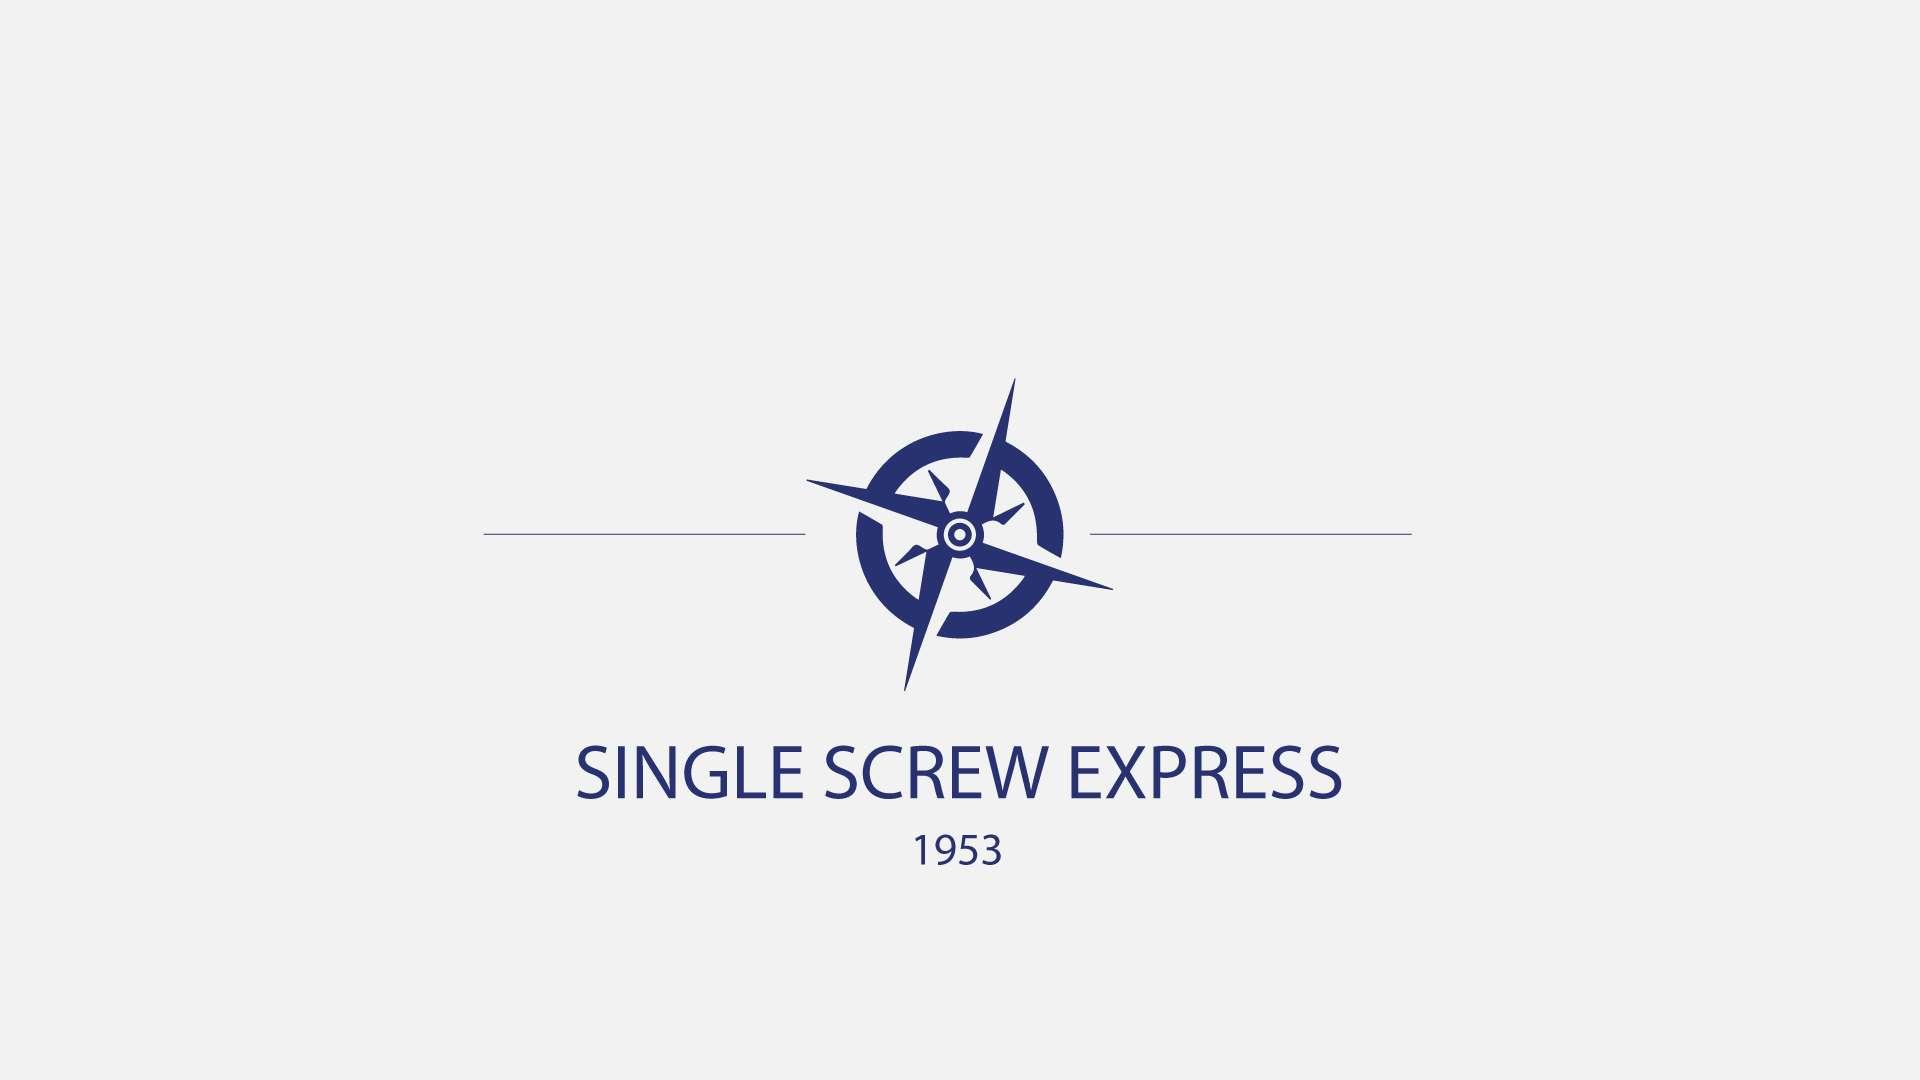 Single Screw Express